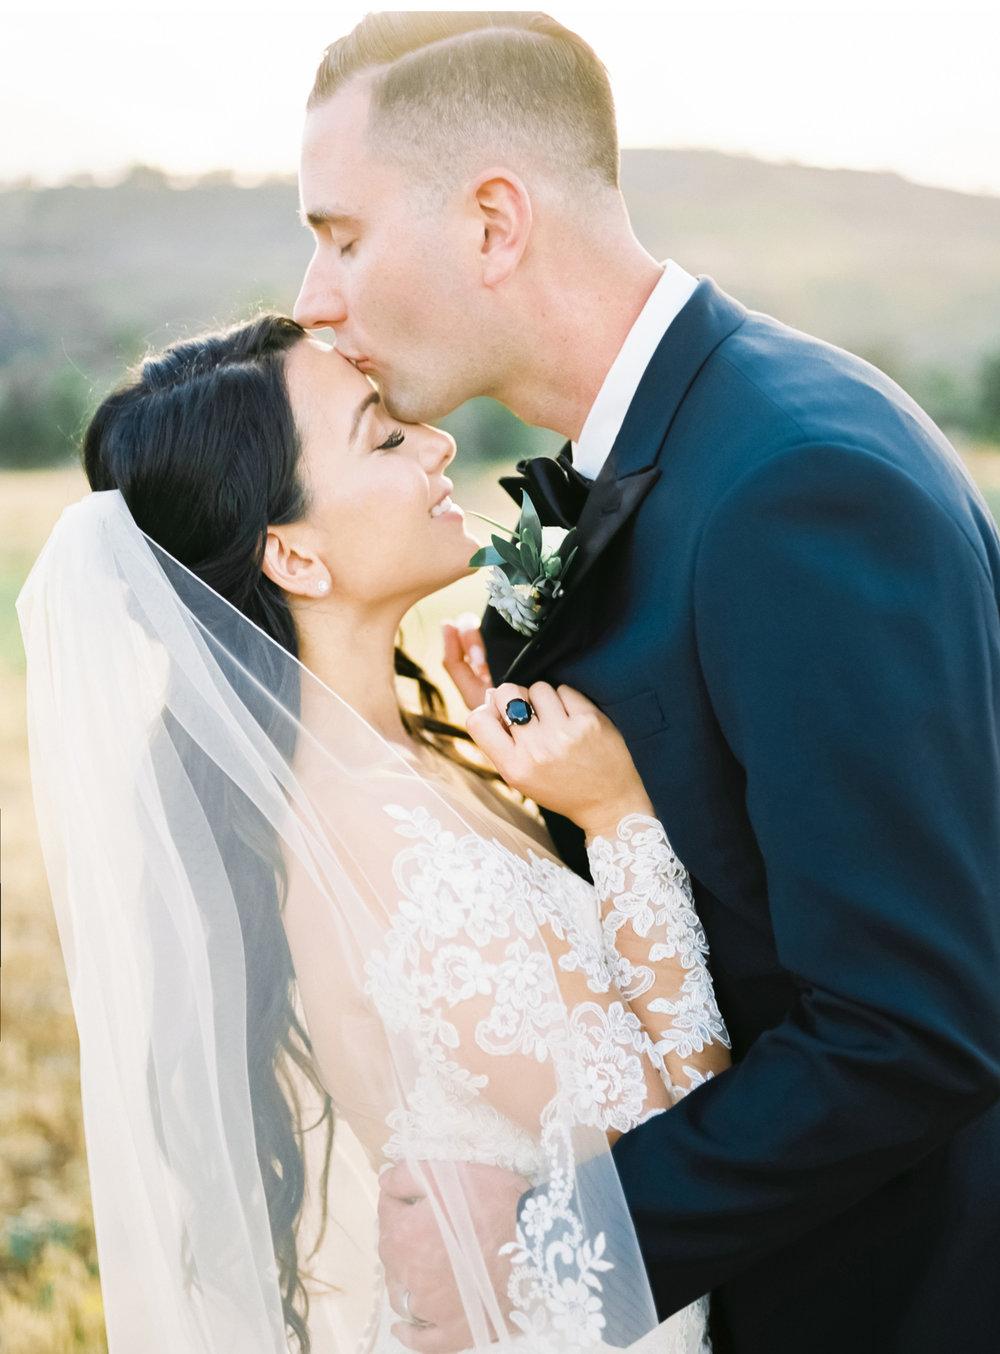 Malibu-Weddings-Natalie-Schutt-Photography_07.jpg